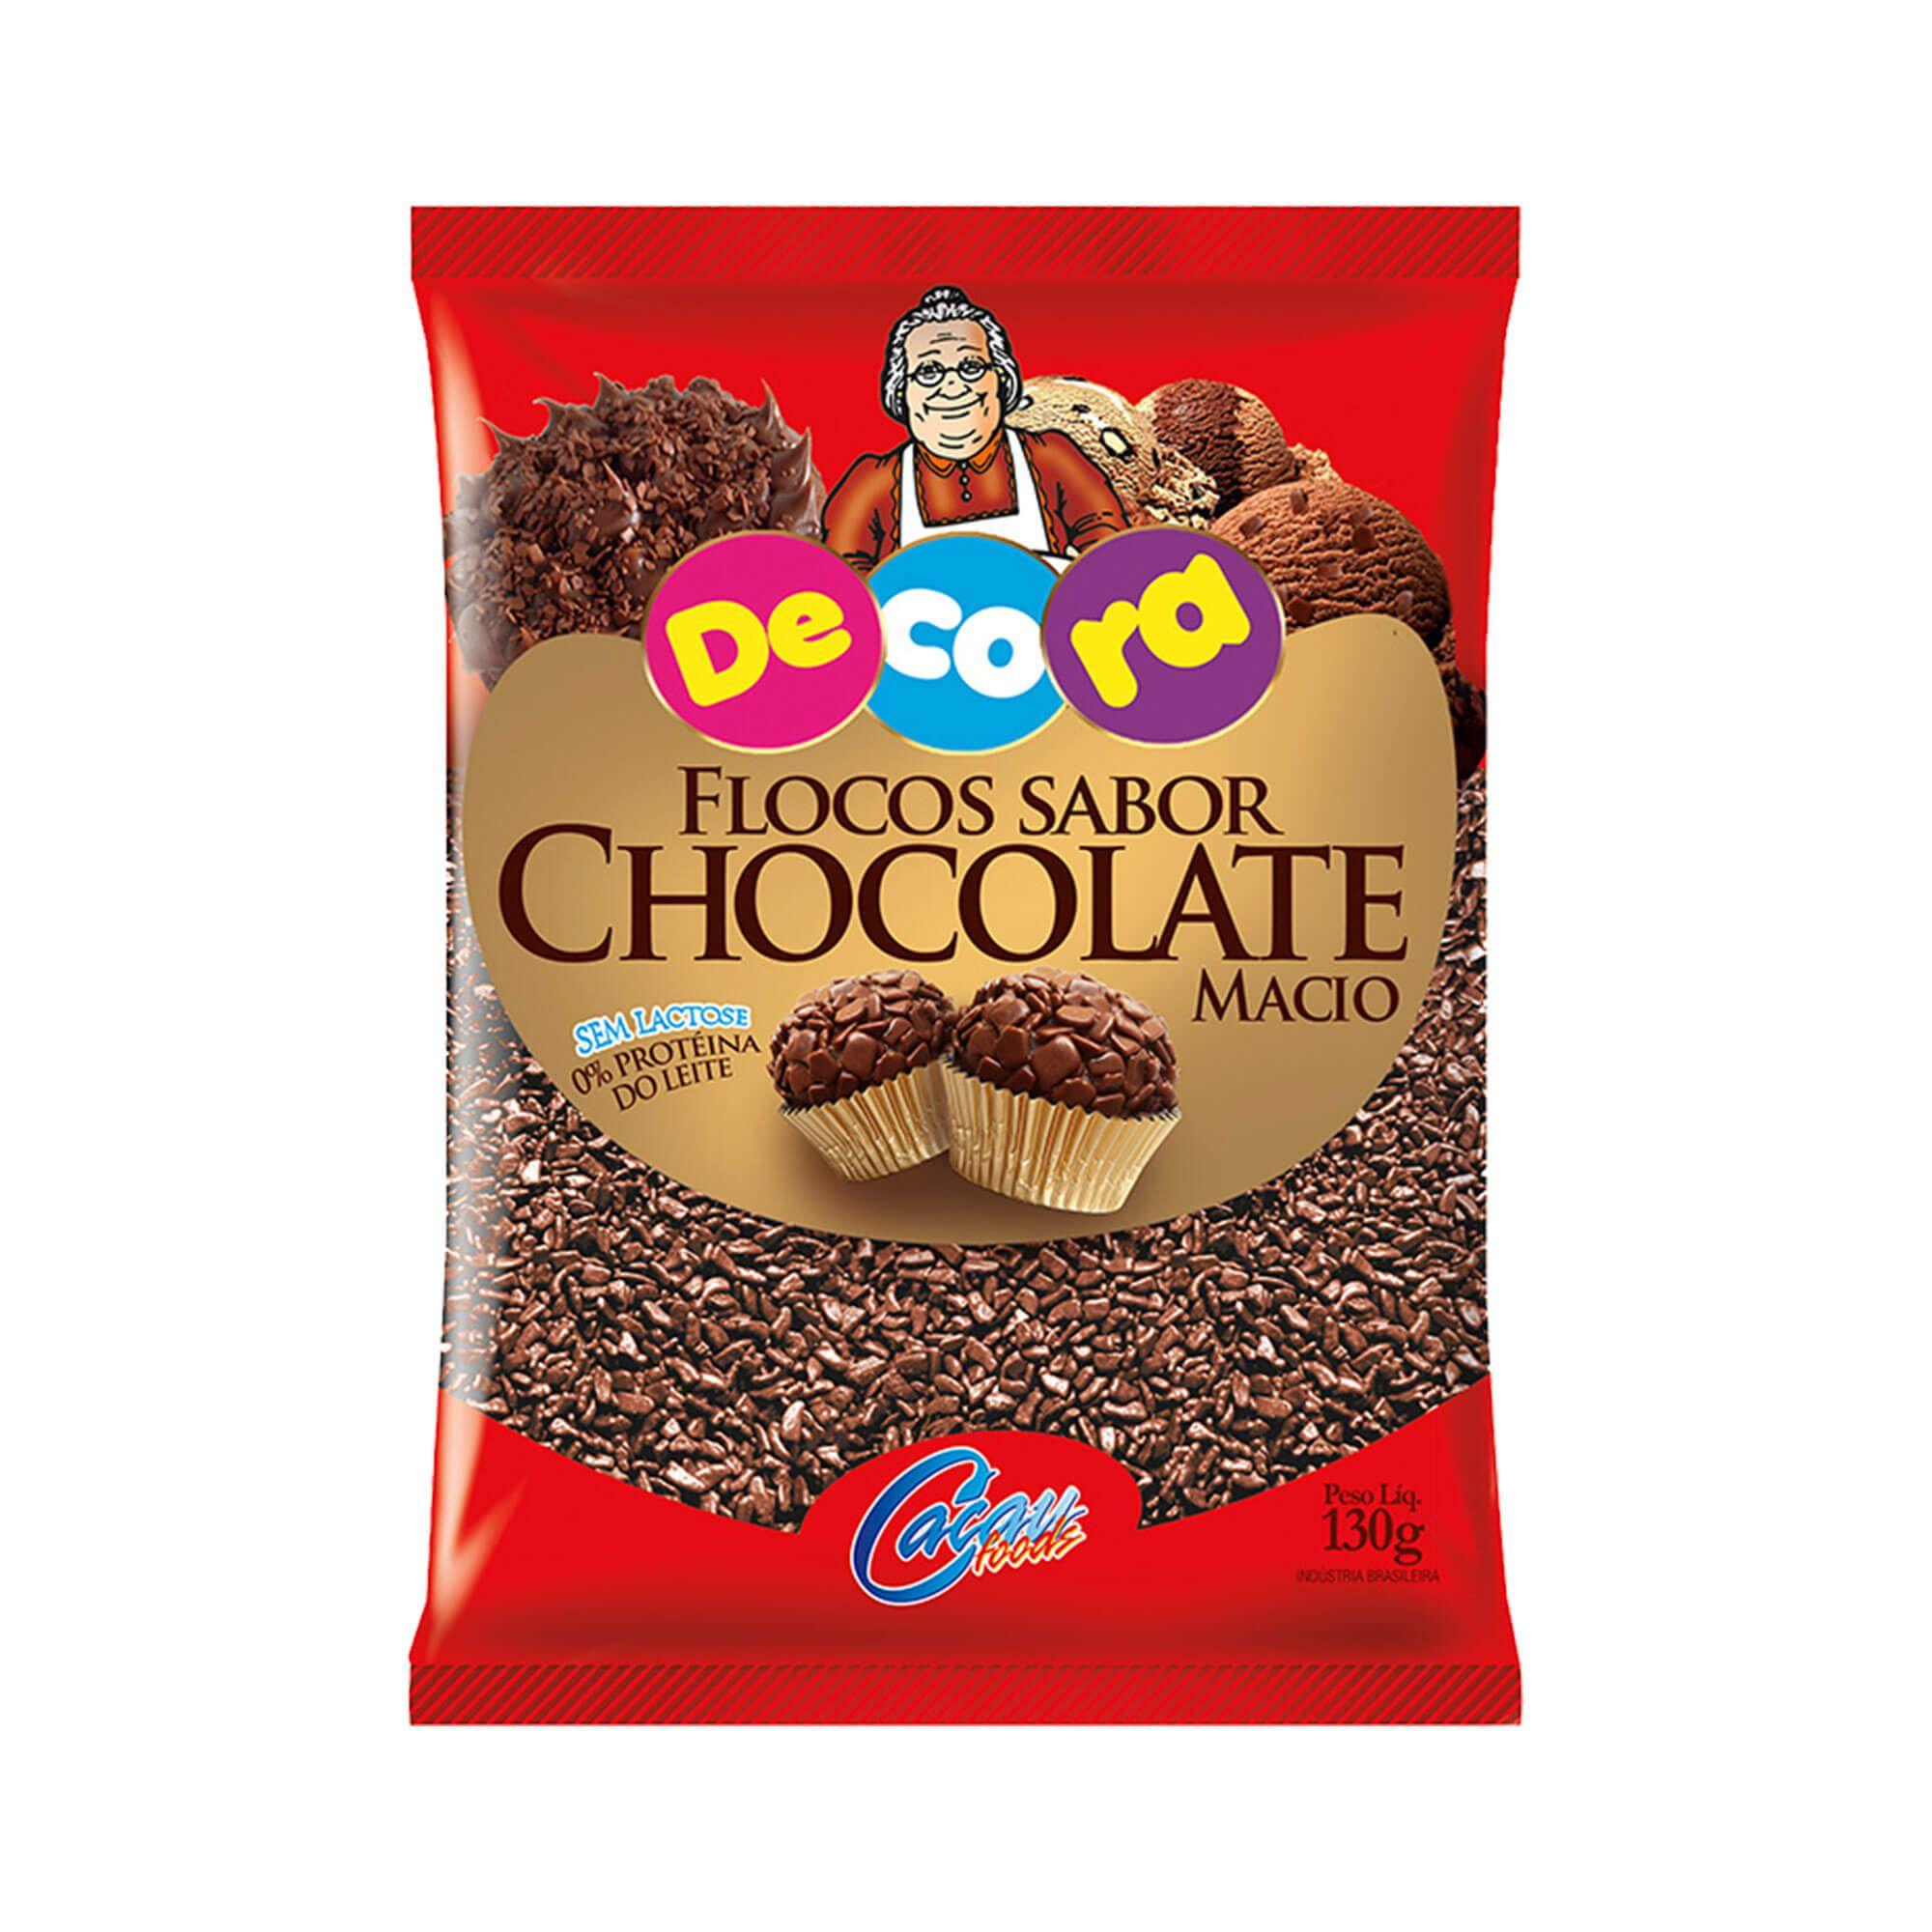 Flocos Sabor Chocolate Macio Decora 130G